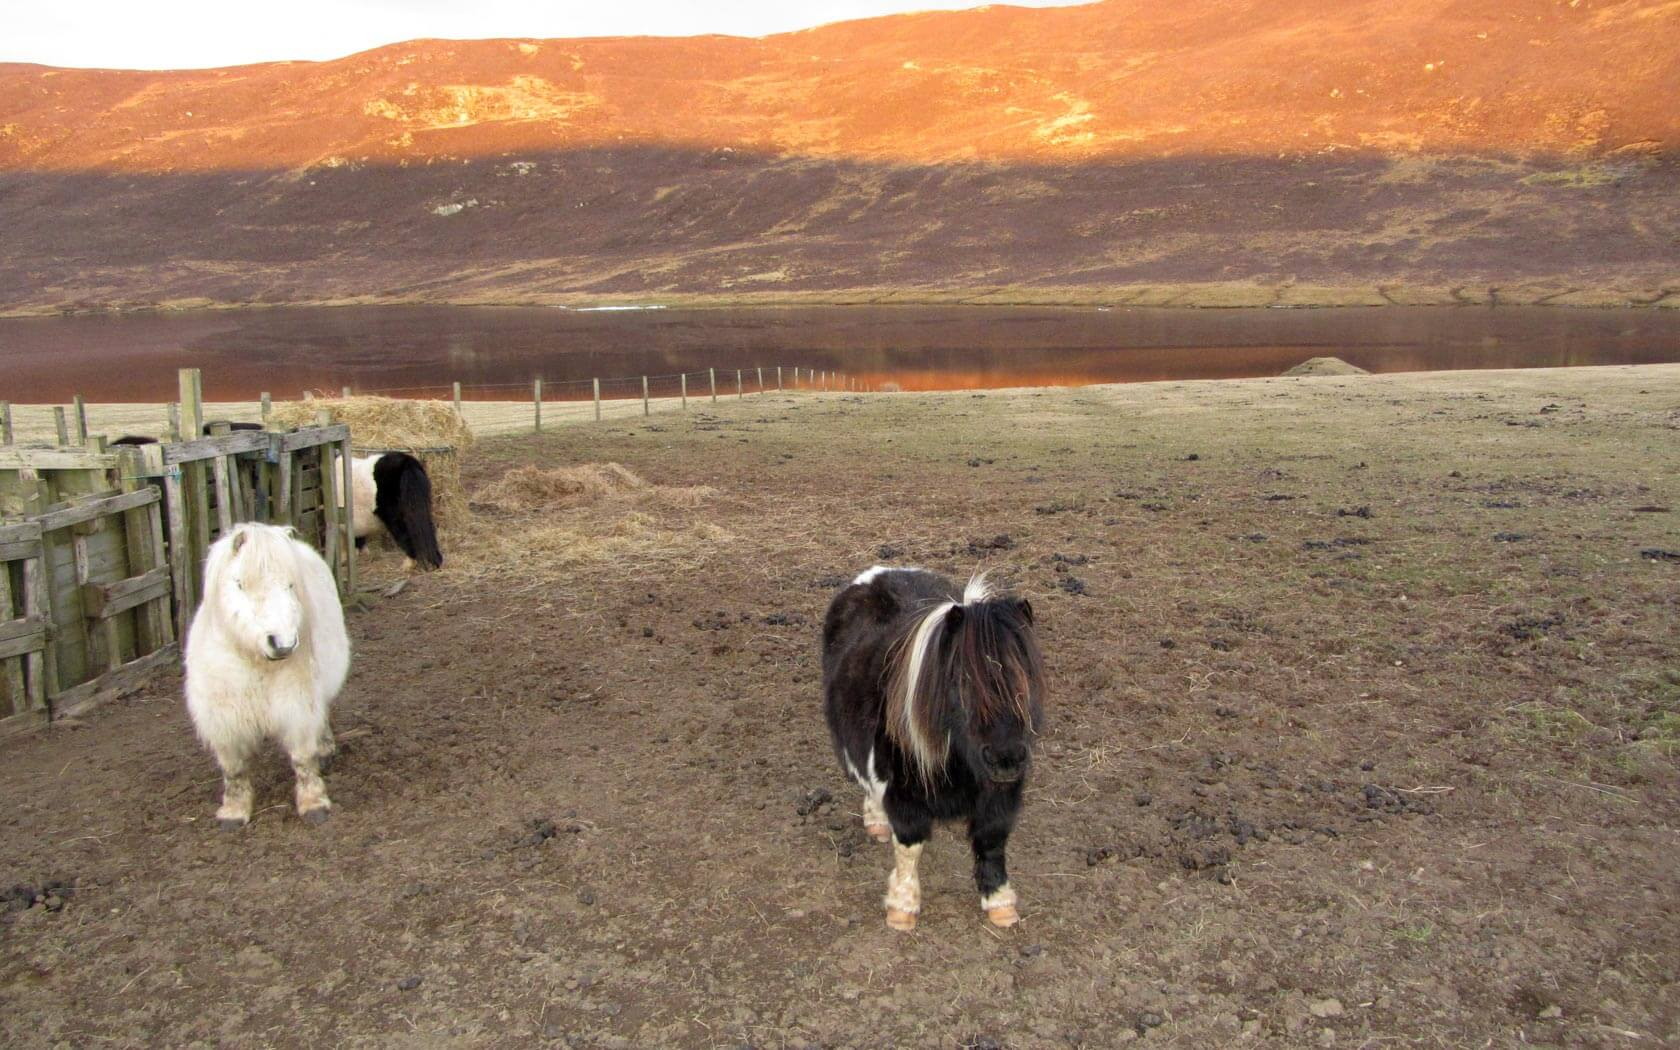 Shetland Reisebericht: Shetlandponys auf der Weide